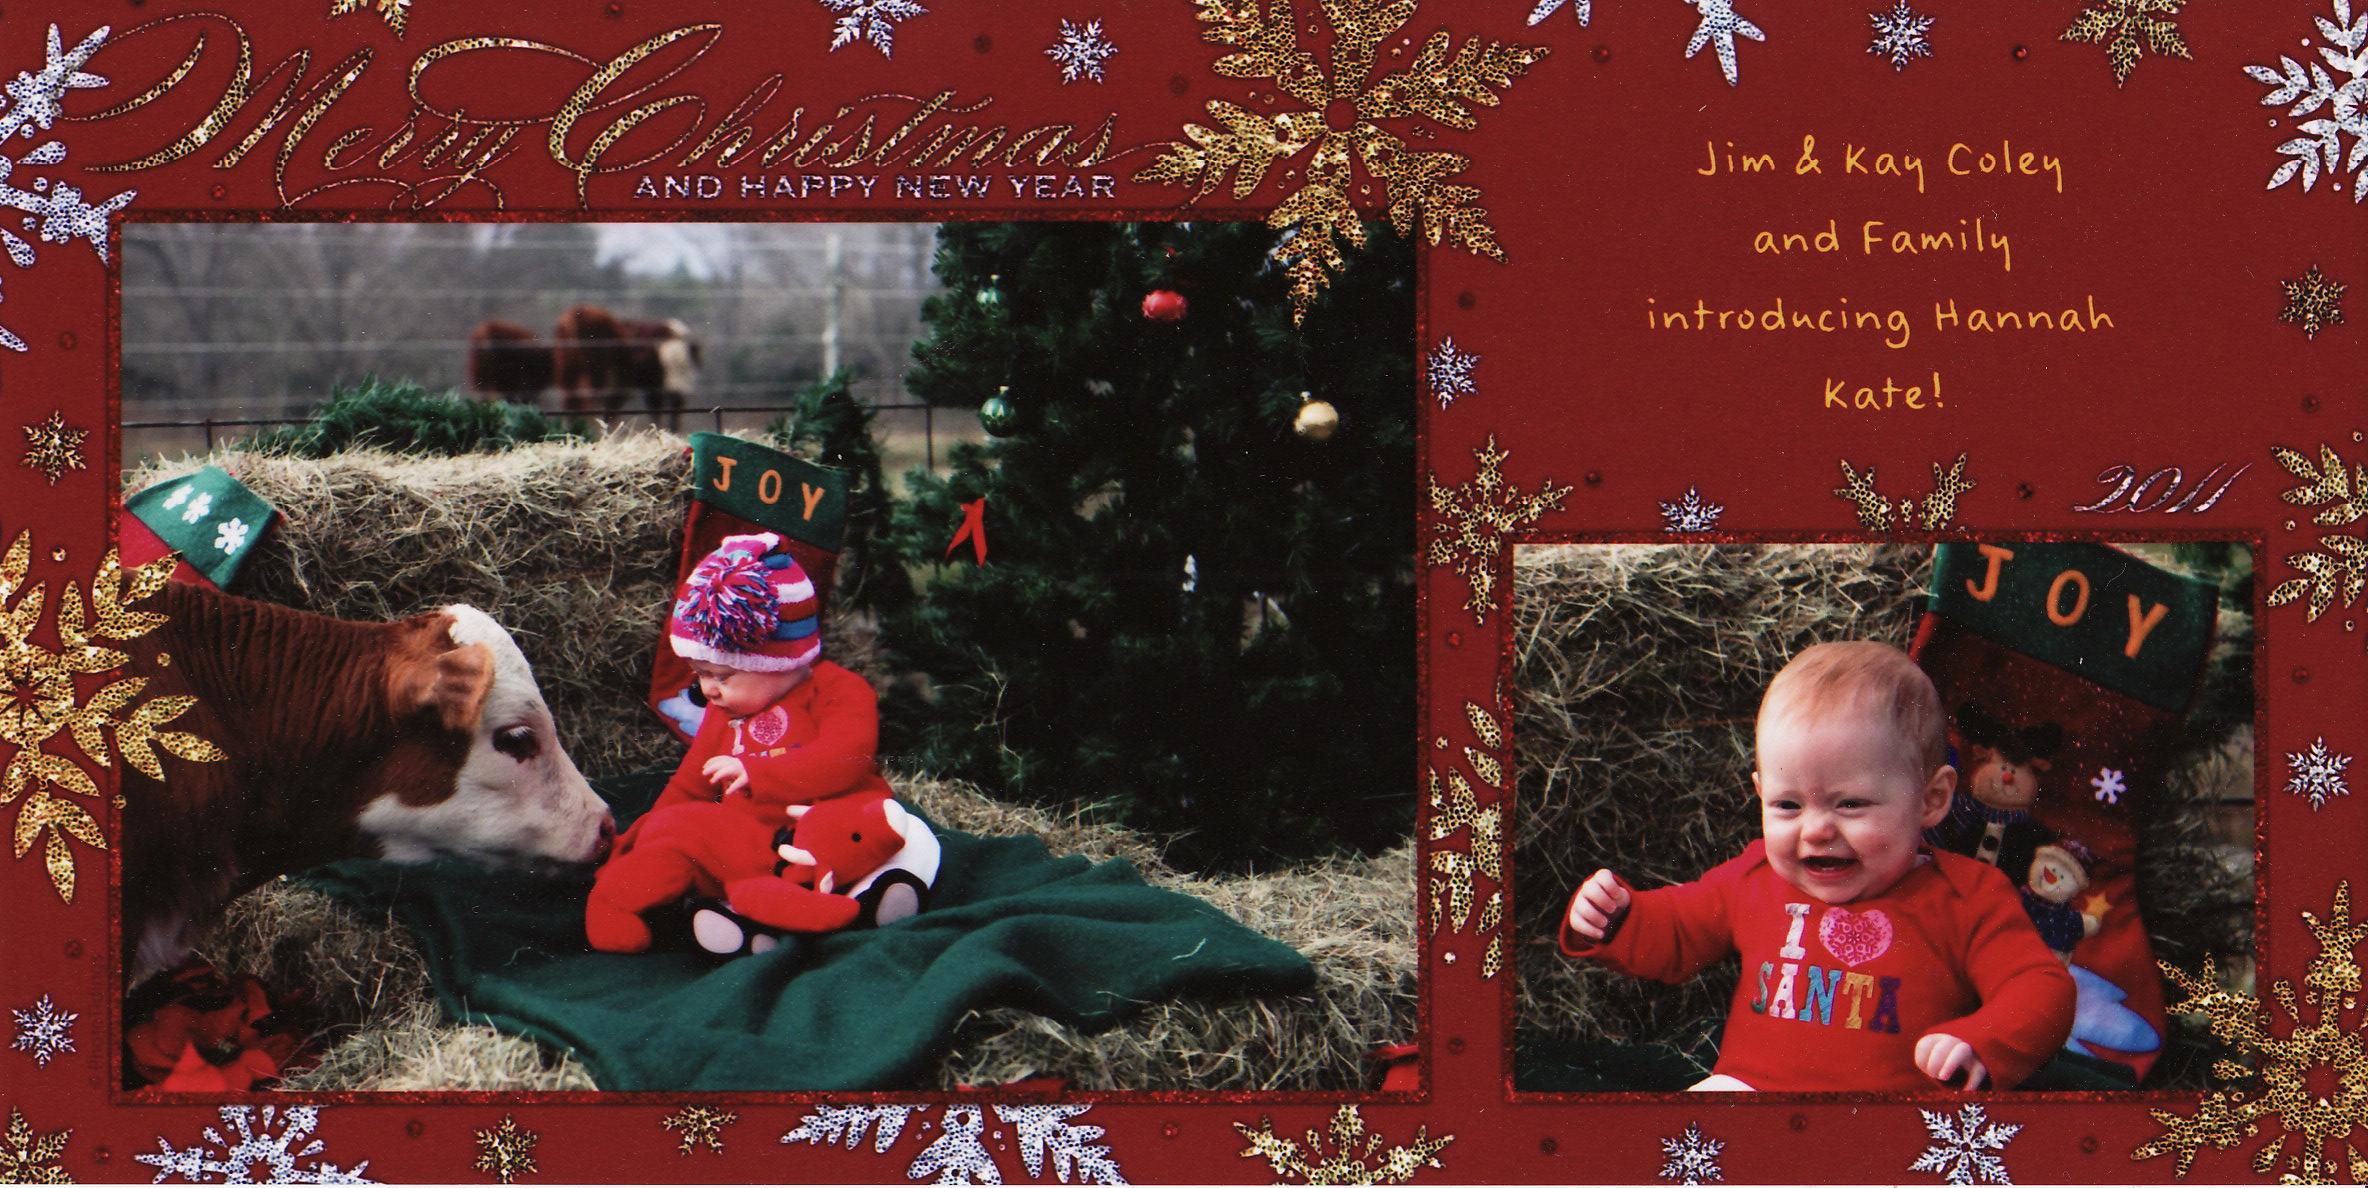 Coley Christmas card 2011